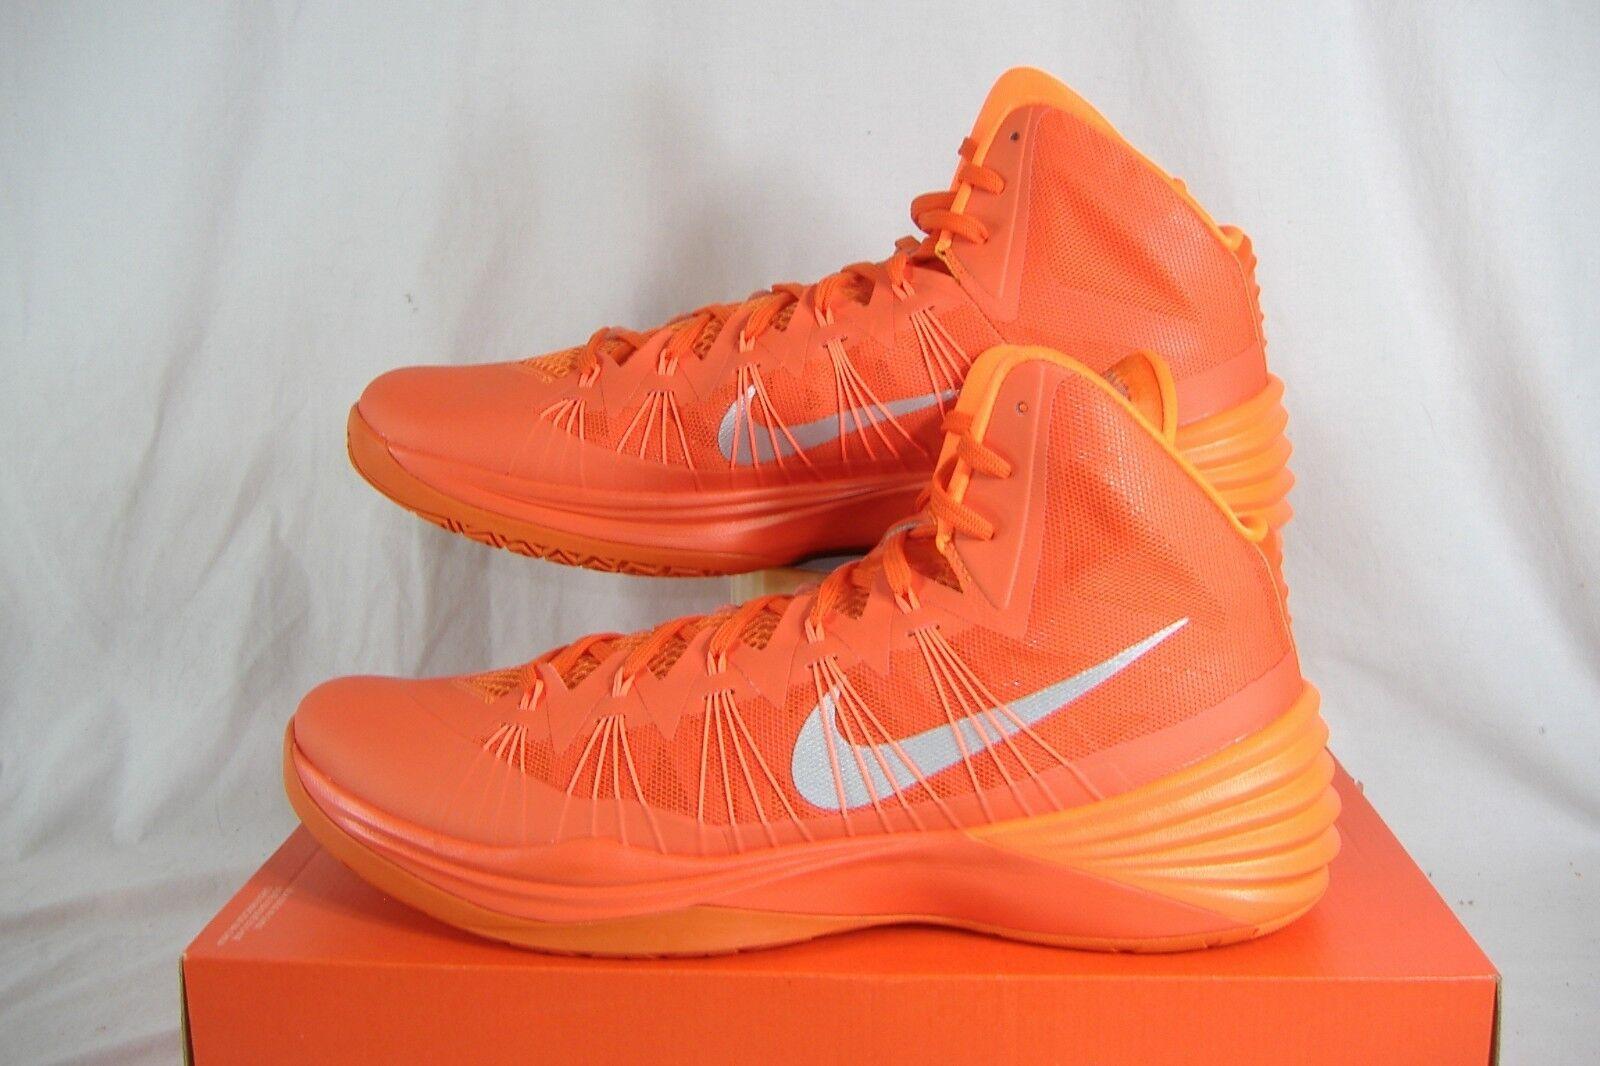 Mens 18 NIKE Hyperdunk 2013 TB Orange High Top Basketball Shoes    584433-800